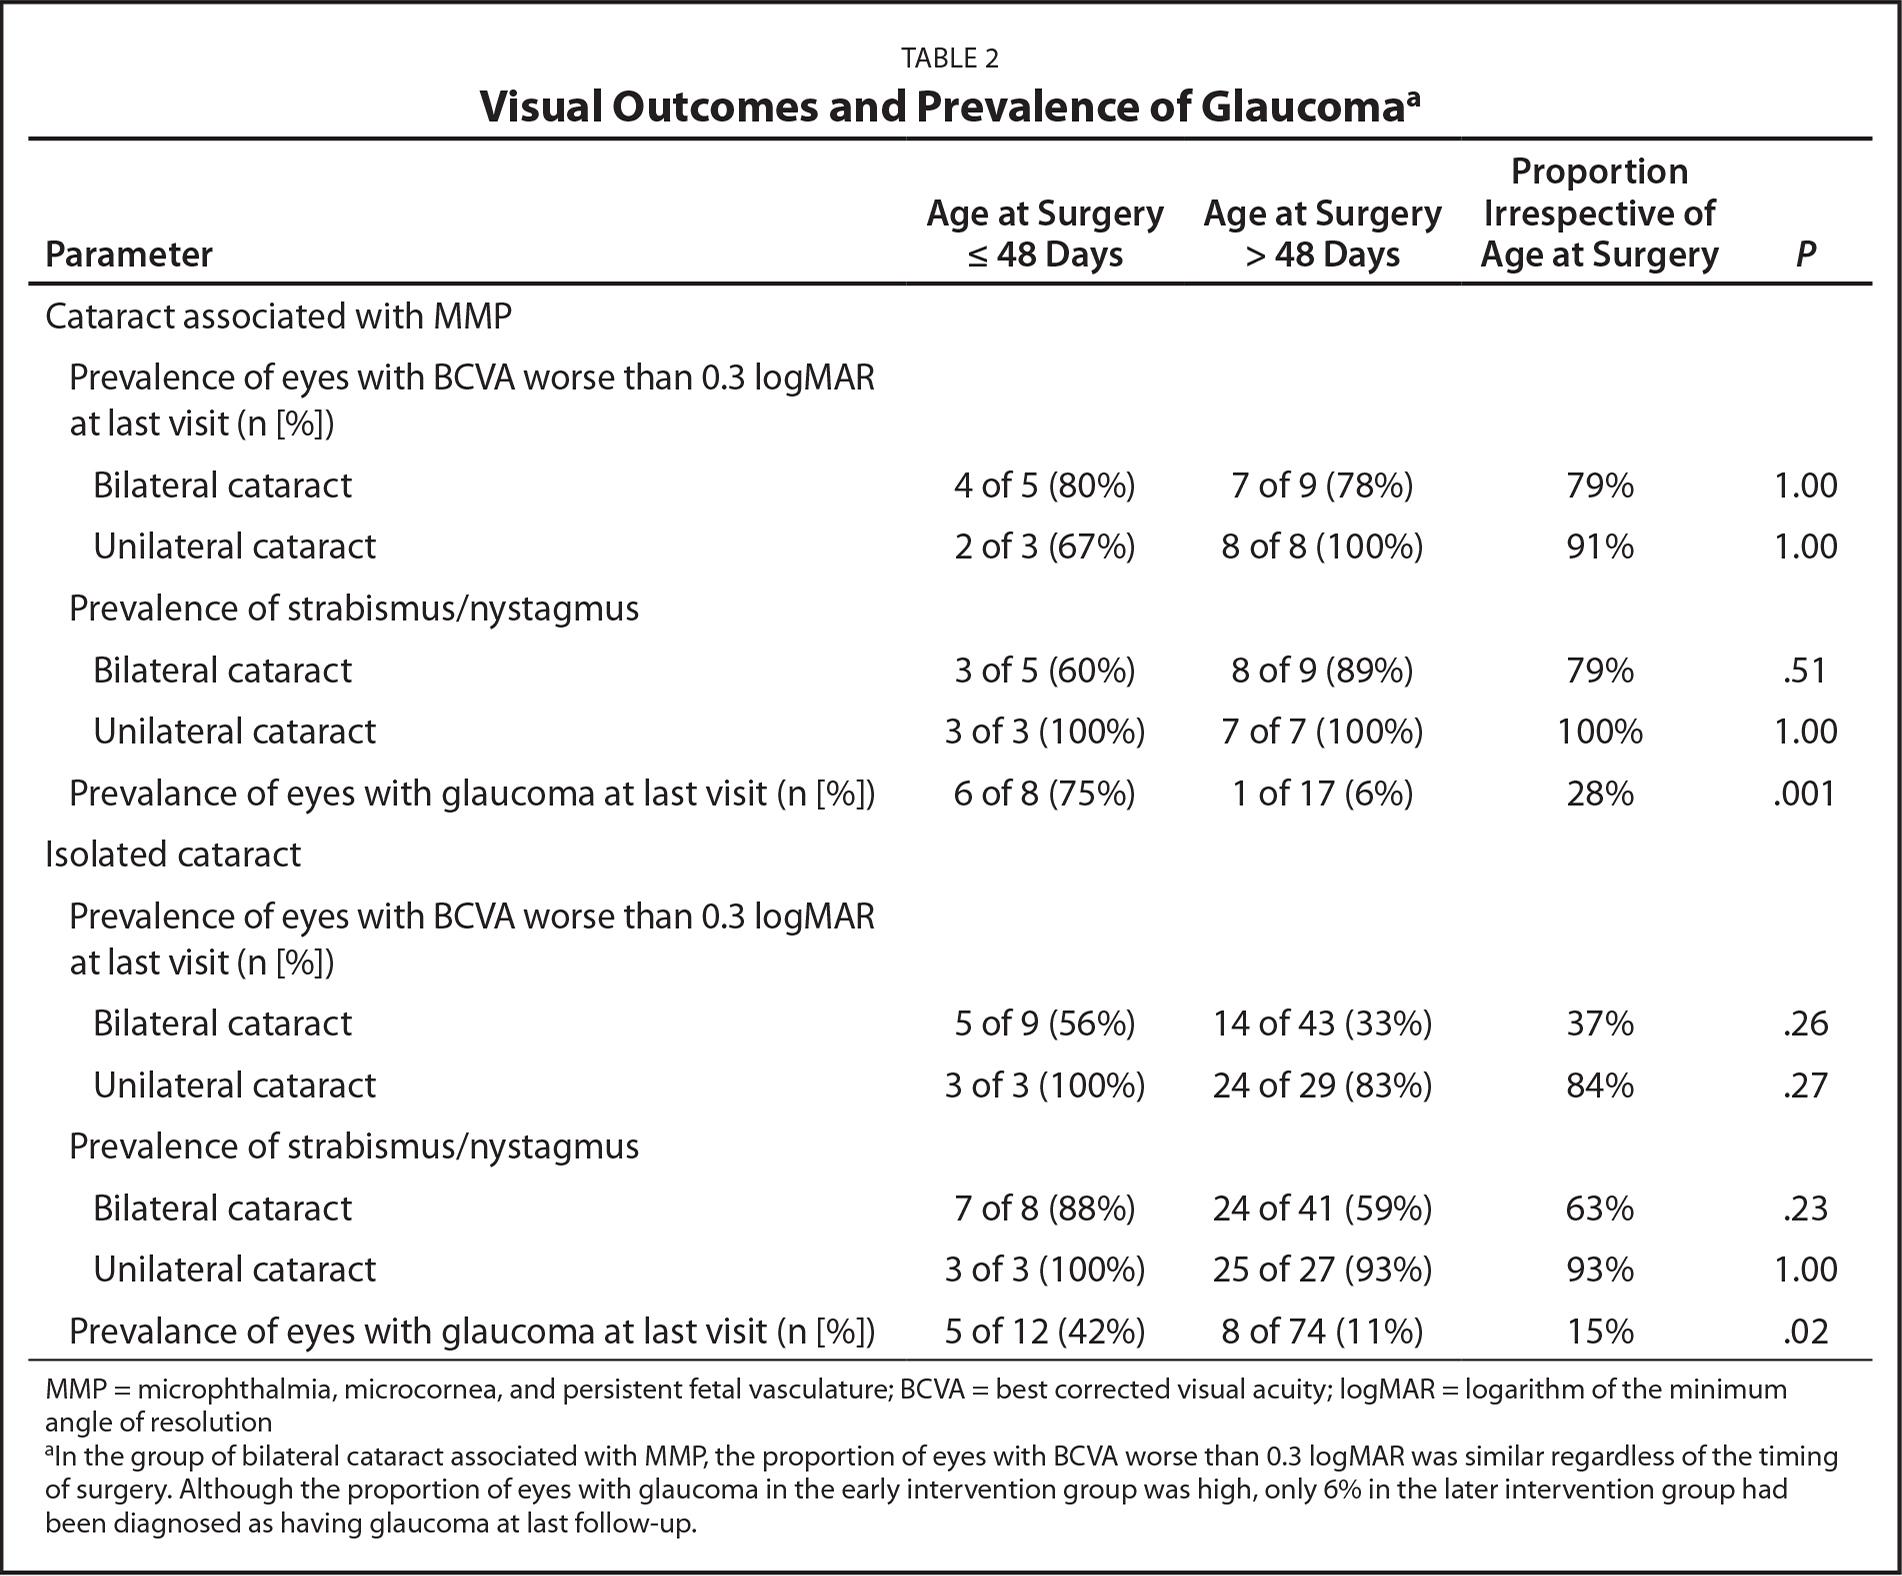 Visual Outcomes and Prevalence of Glaucomaa